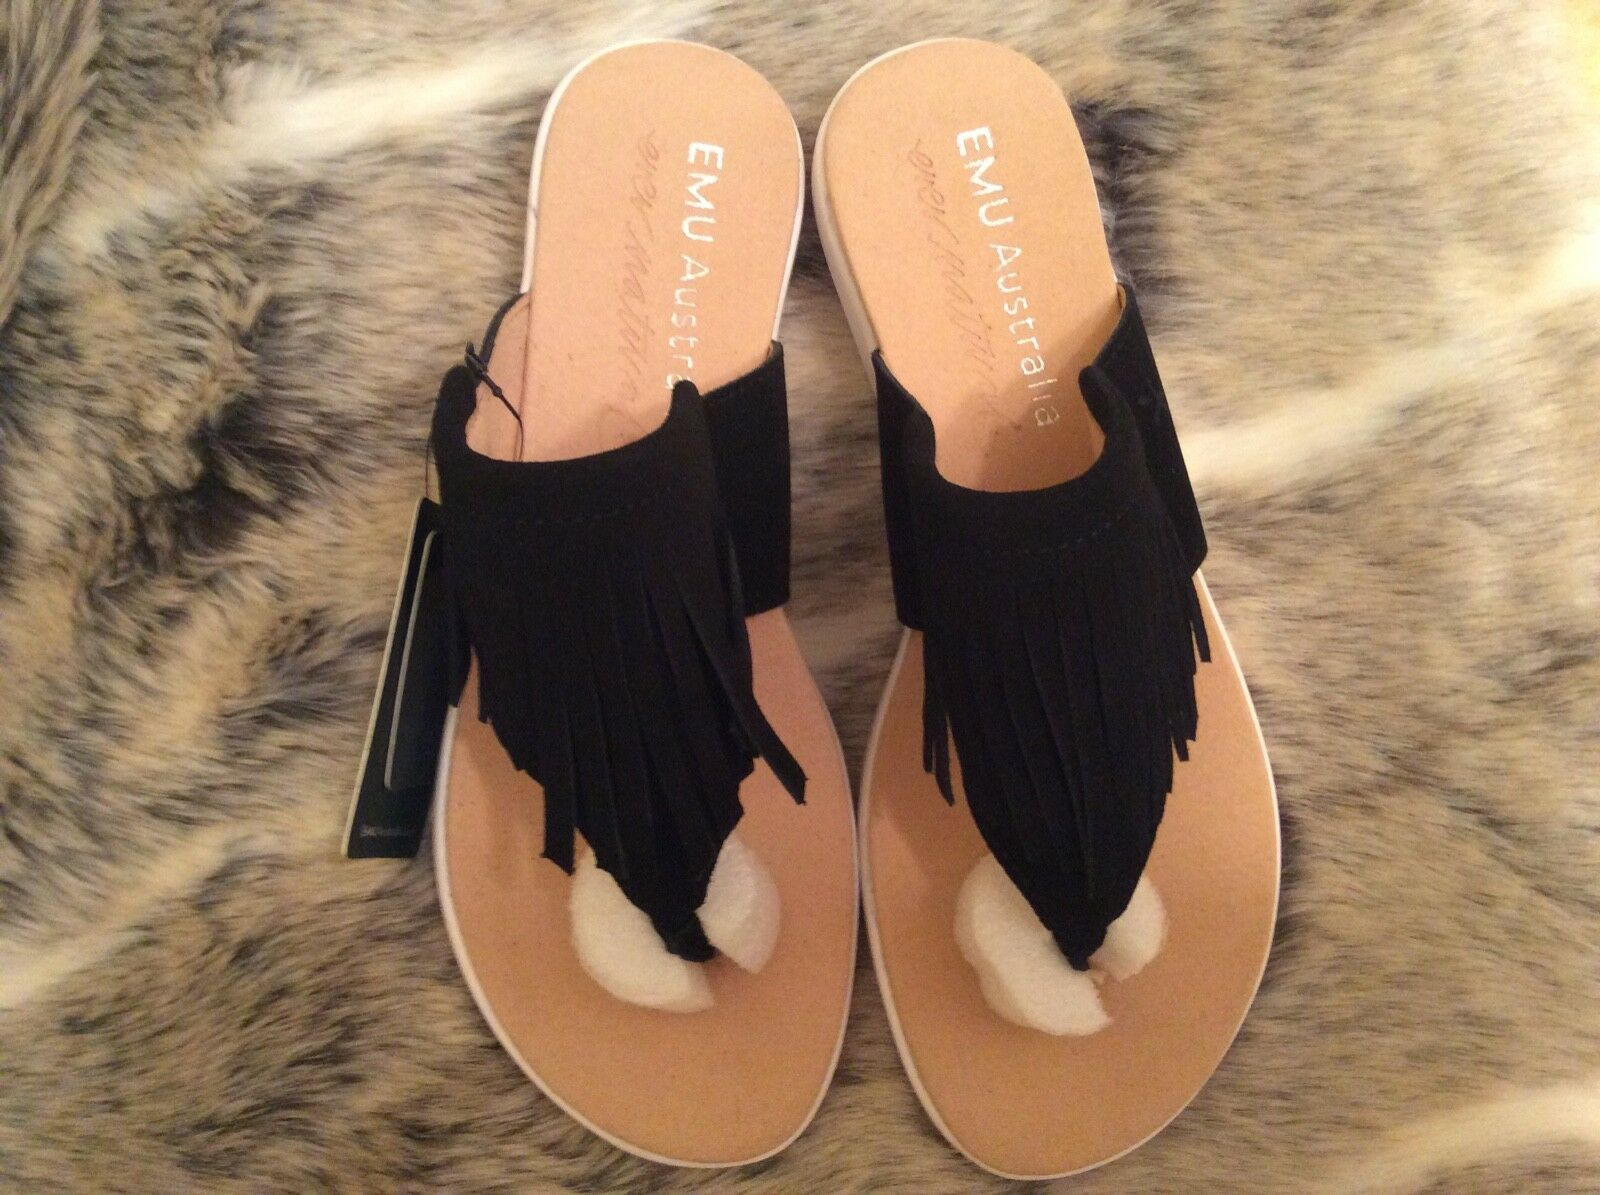 online retailer 3dbc7 52b14 Emu Australia Suede iris Black Fringed Thong Sandals